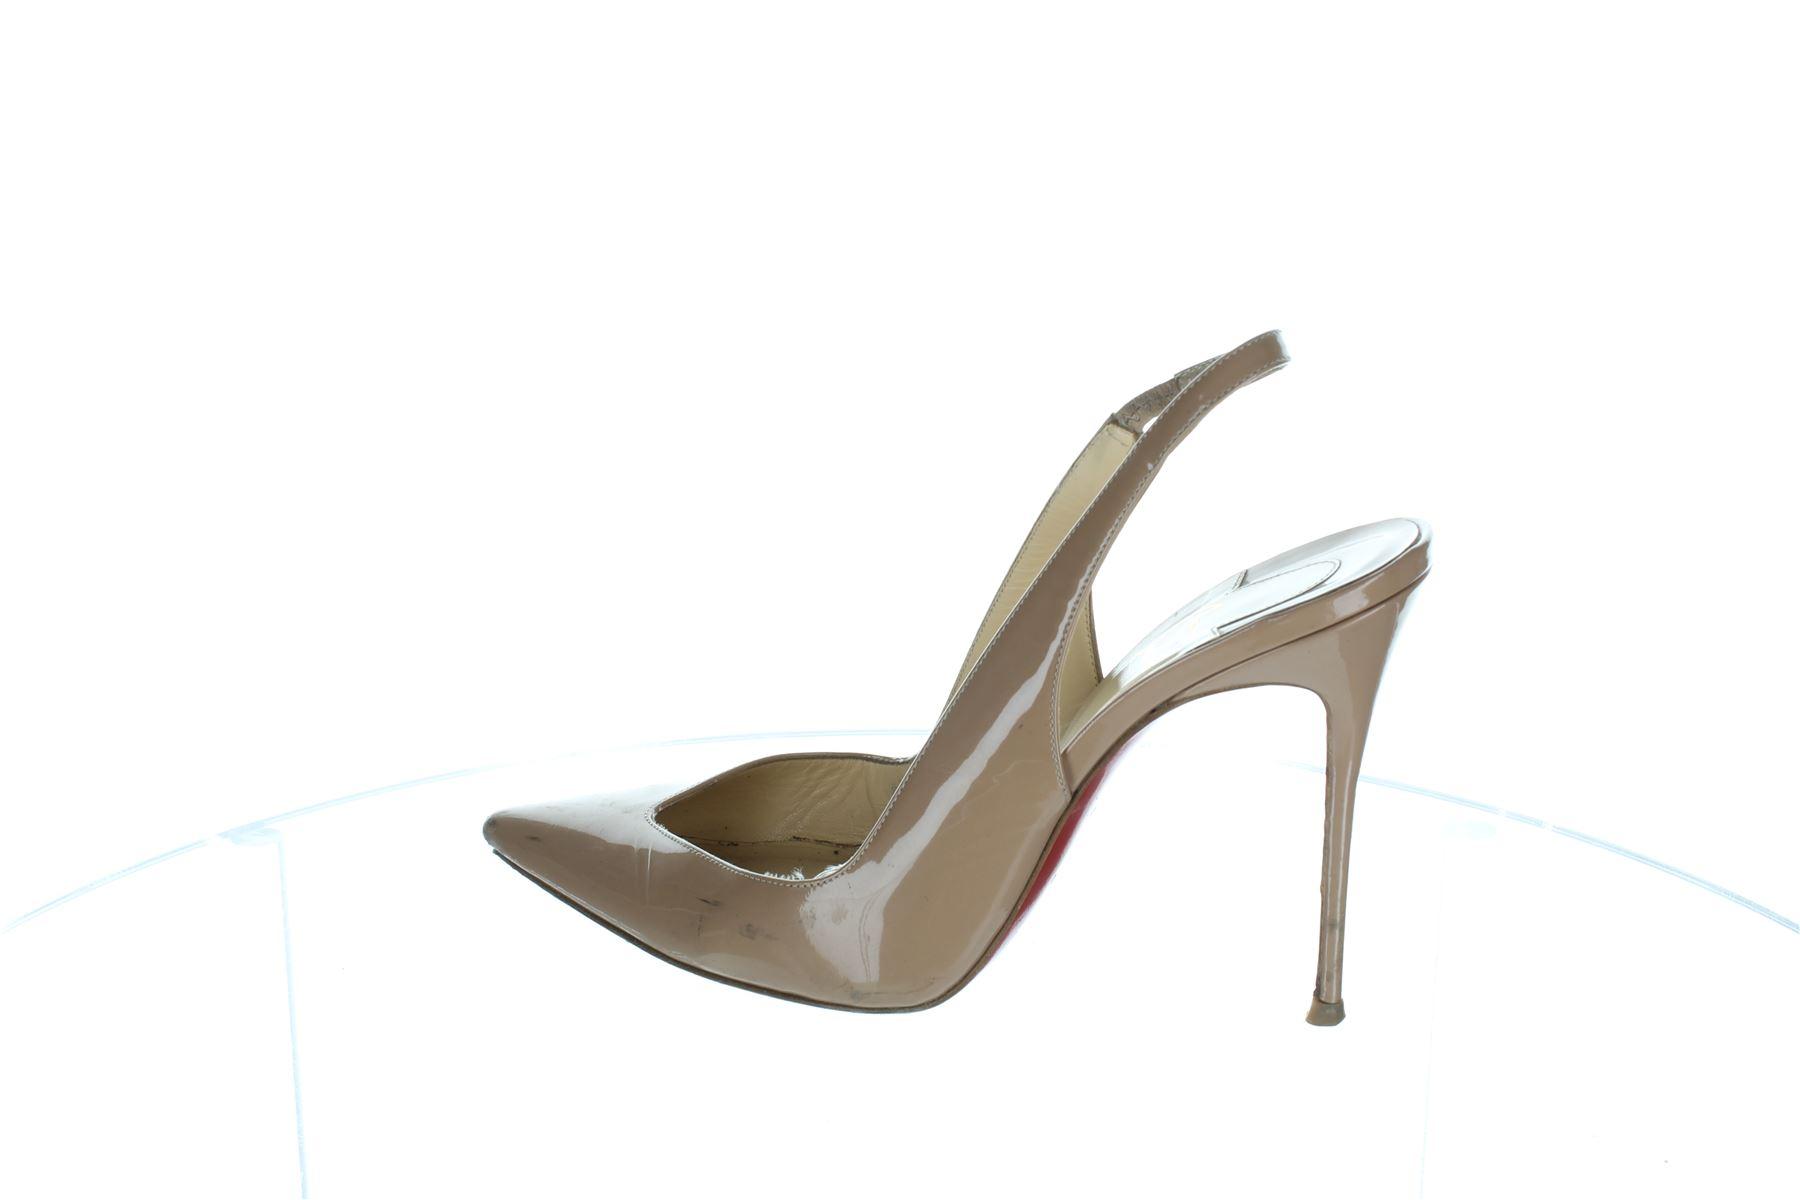 2b2792432f5 ... cheap online 00s2hknr c4cf3 fc822  new zealand christian louboutin  flueve beige patent leather heels pumps uk 7 us 10 eu 40